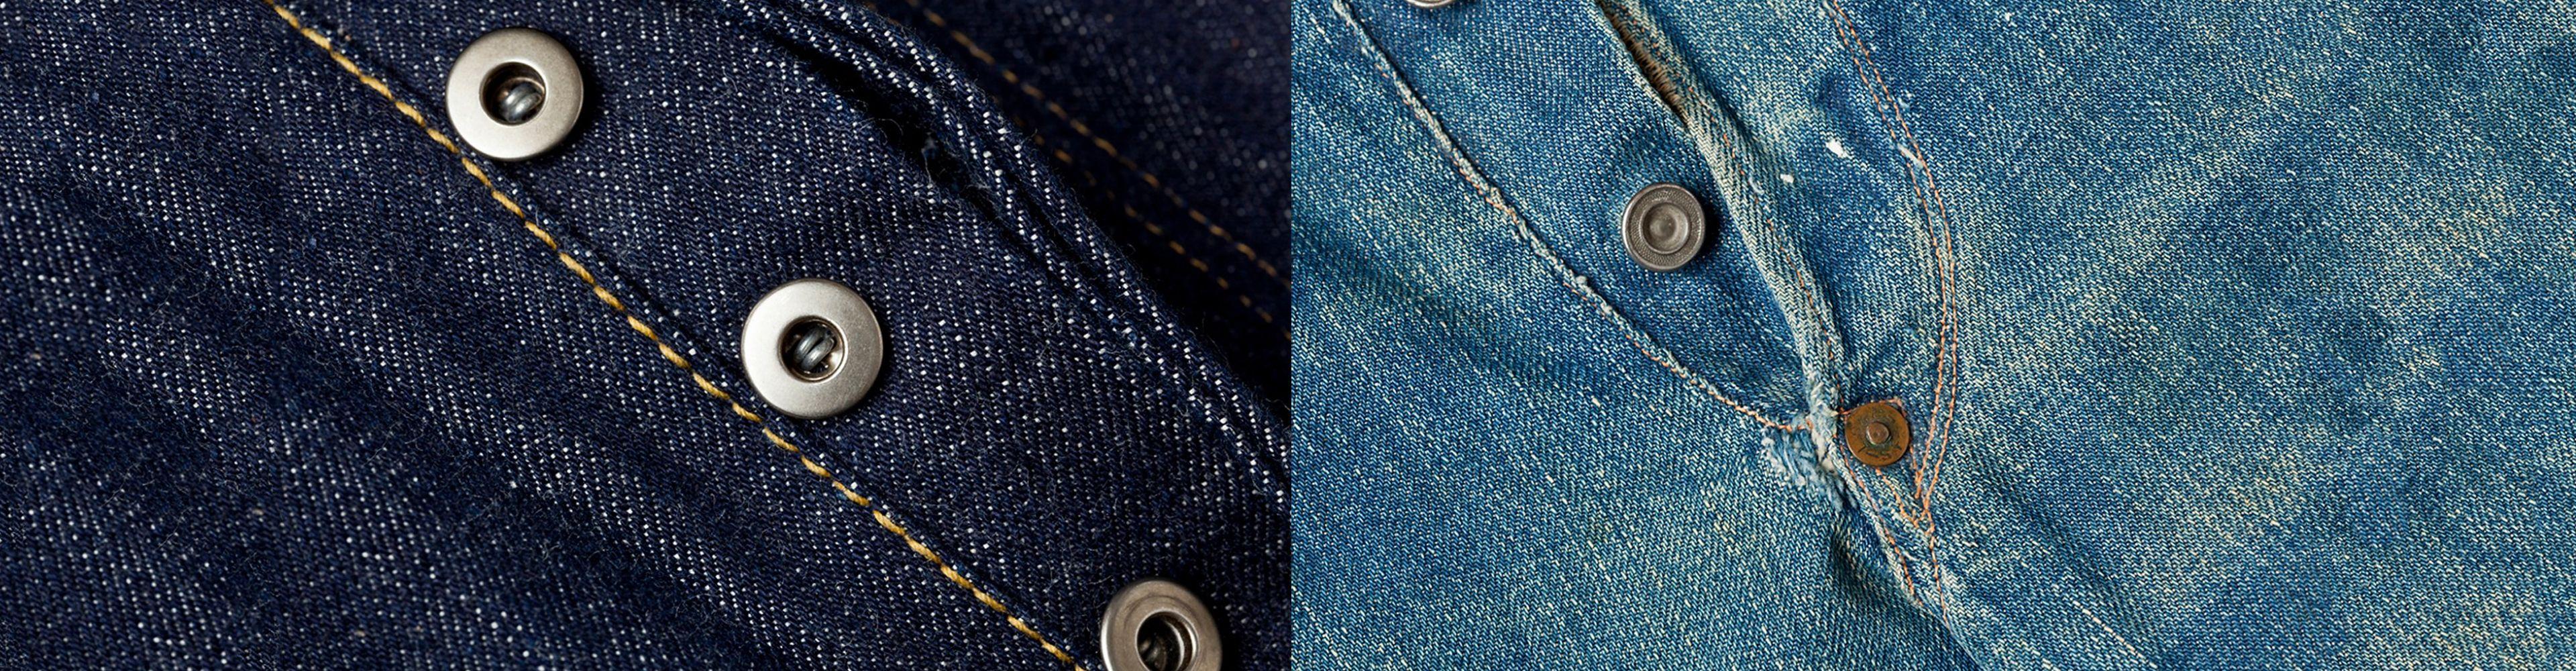 501-series Header Image